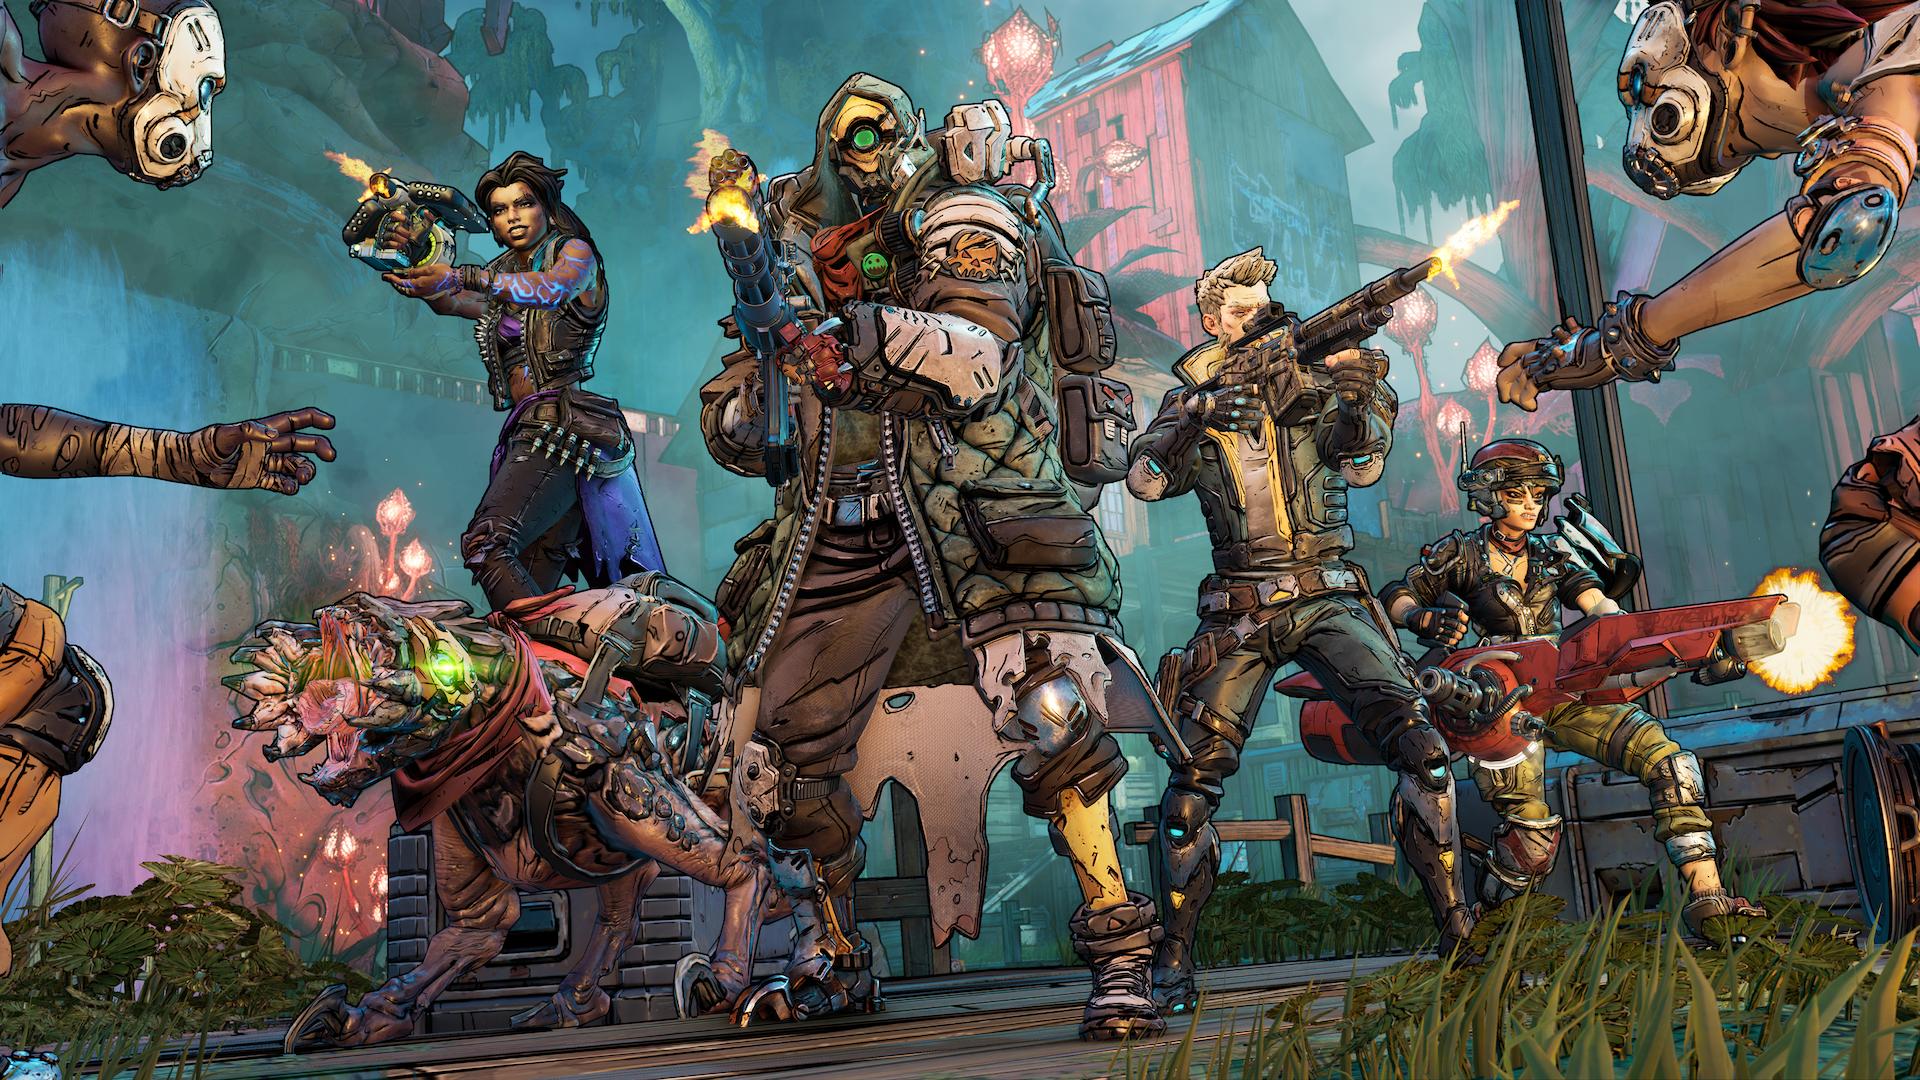 Borderlands 3 PC gamers dump on the game — in Borderlands 2's Steam forums